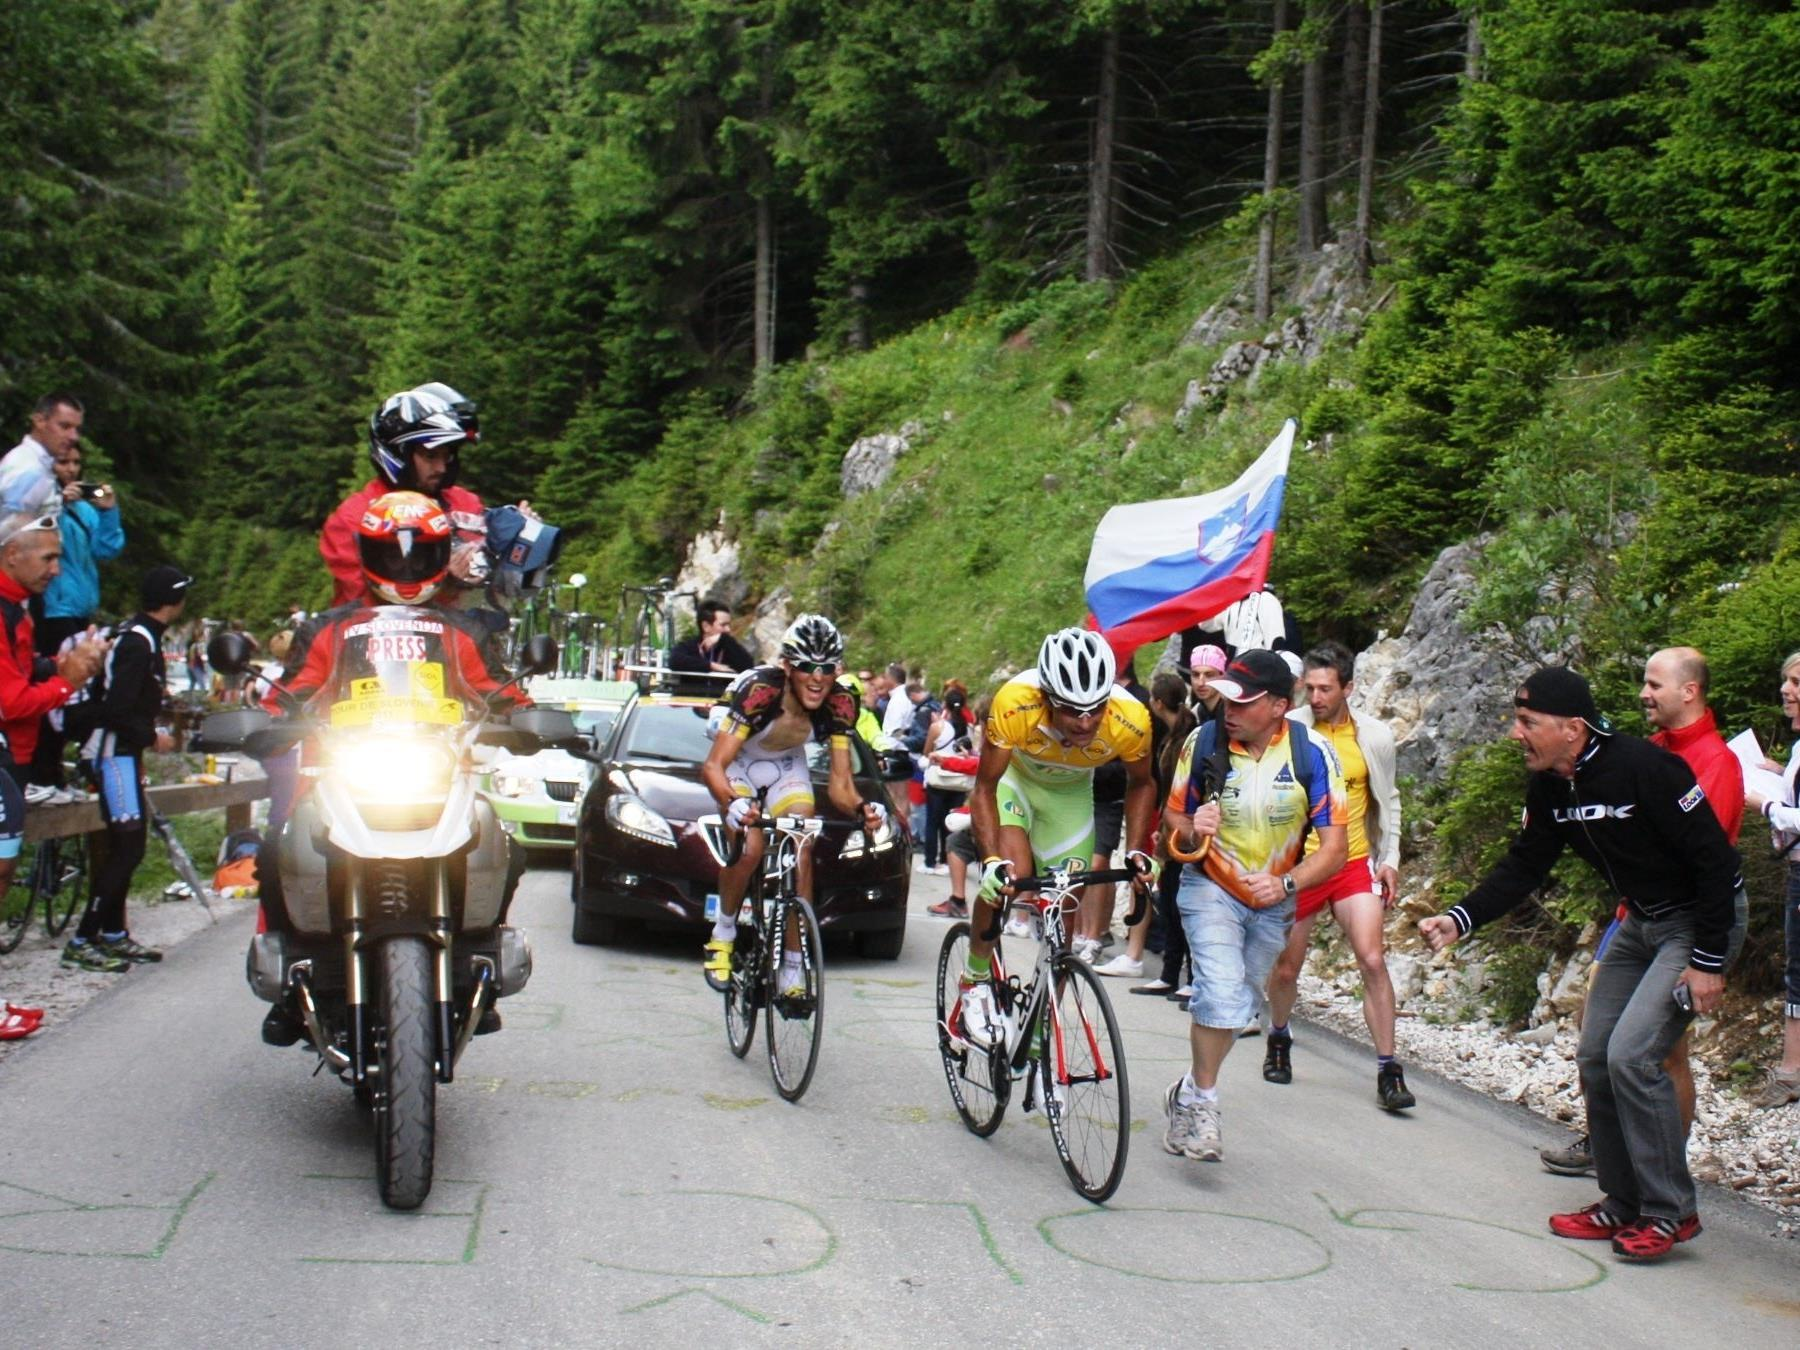 Robert Vrecer verstärkt ab sofort das Team Vorarlberg.